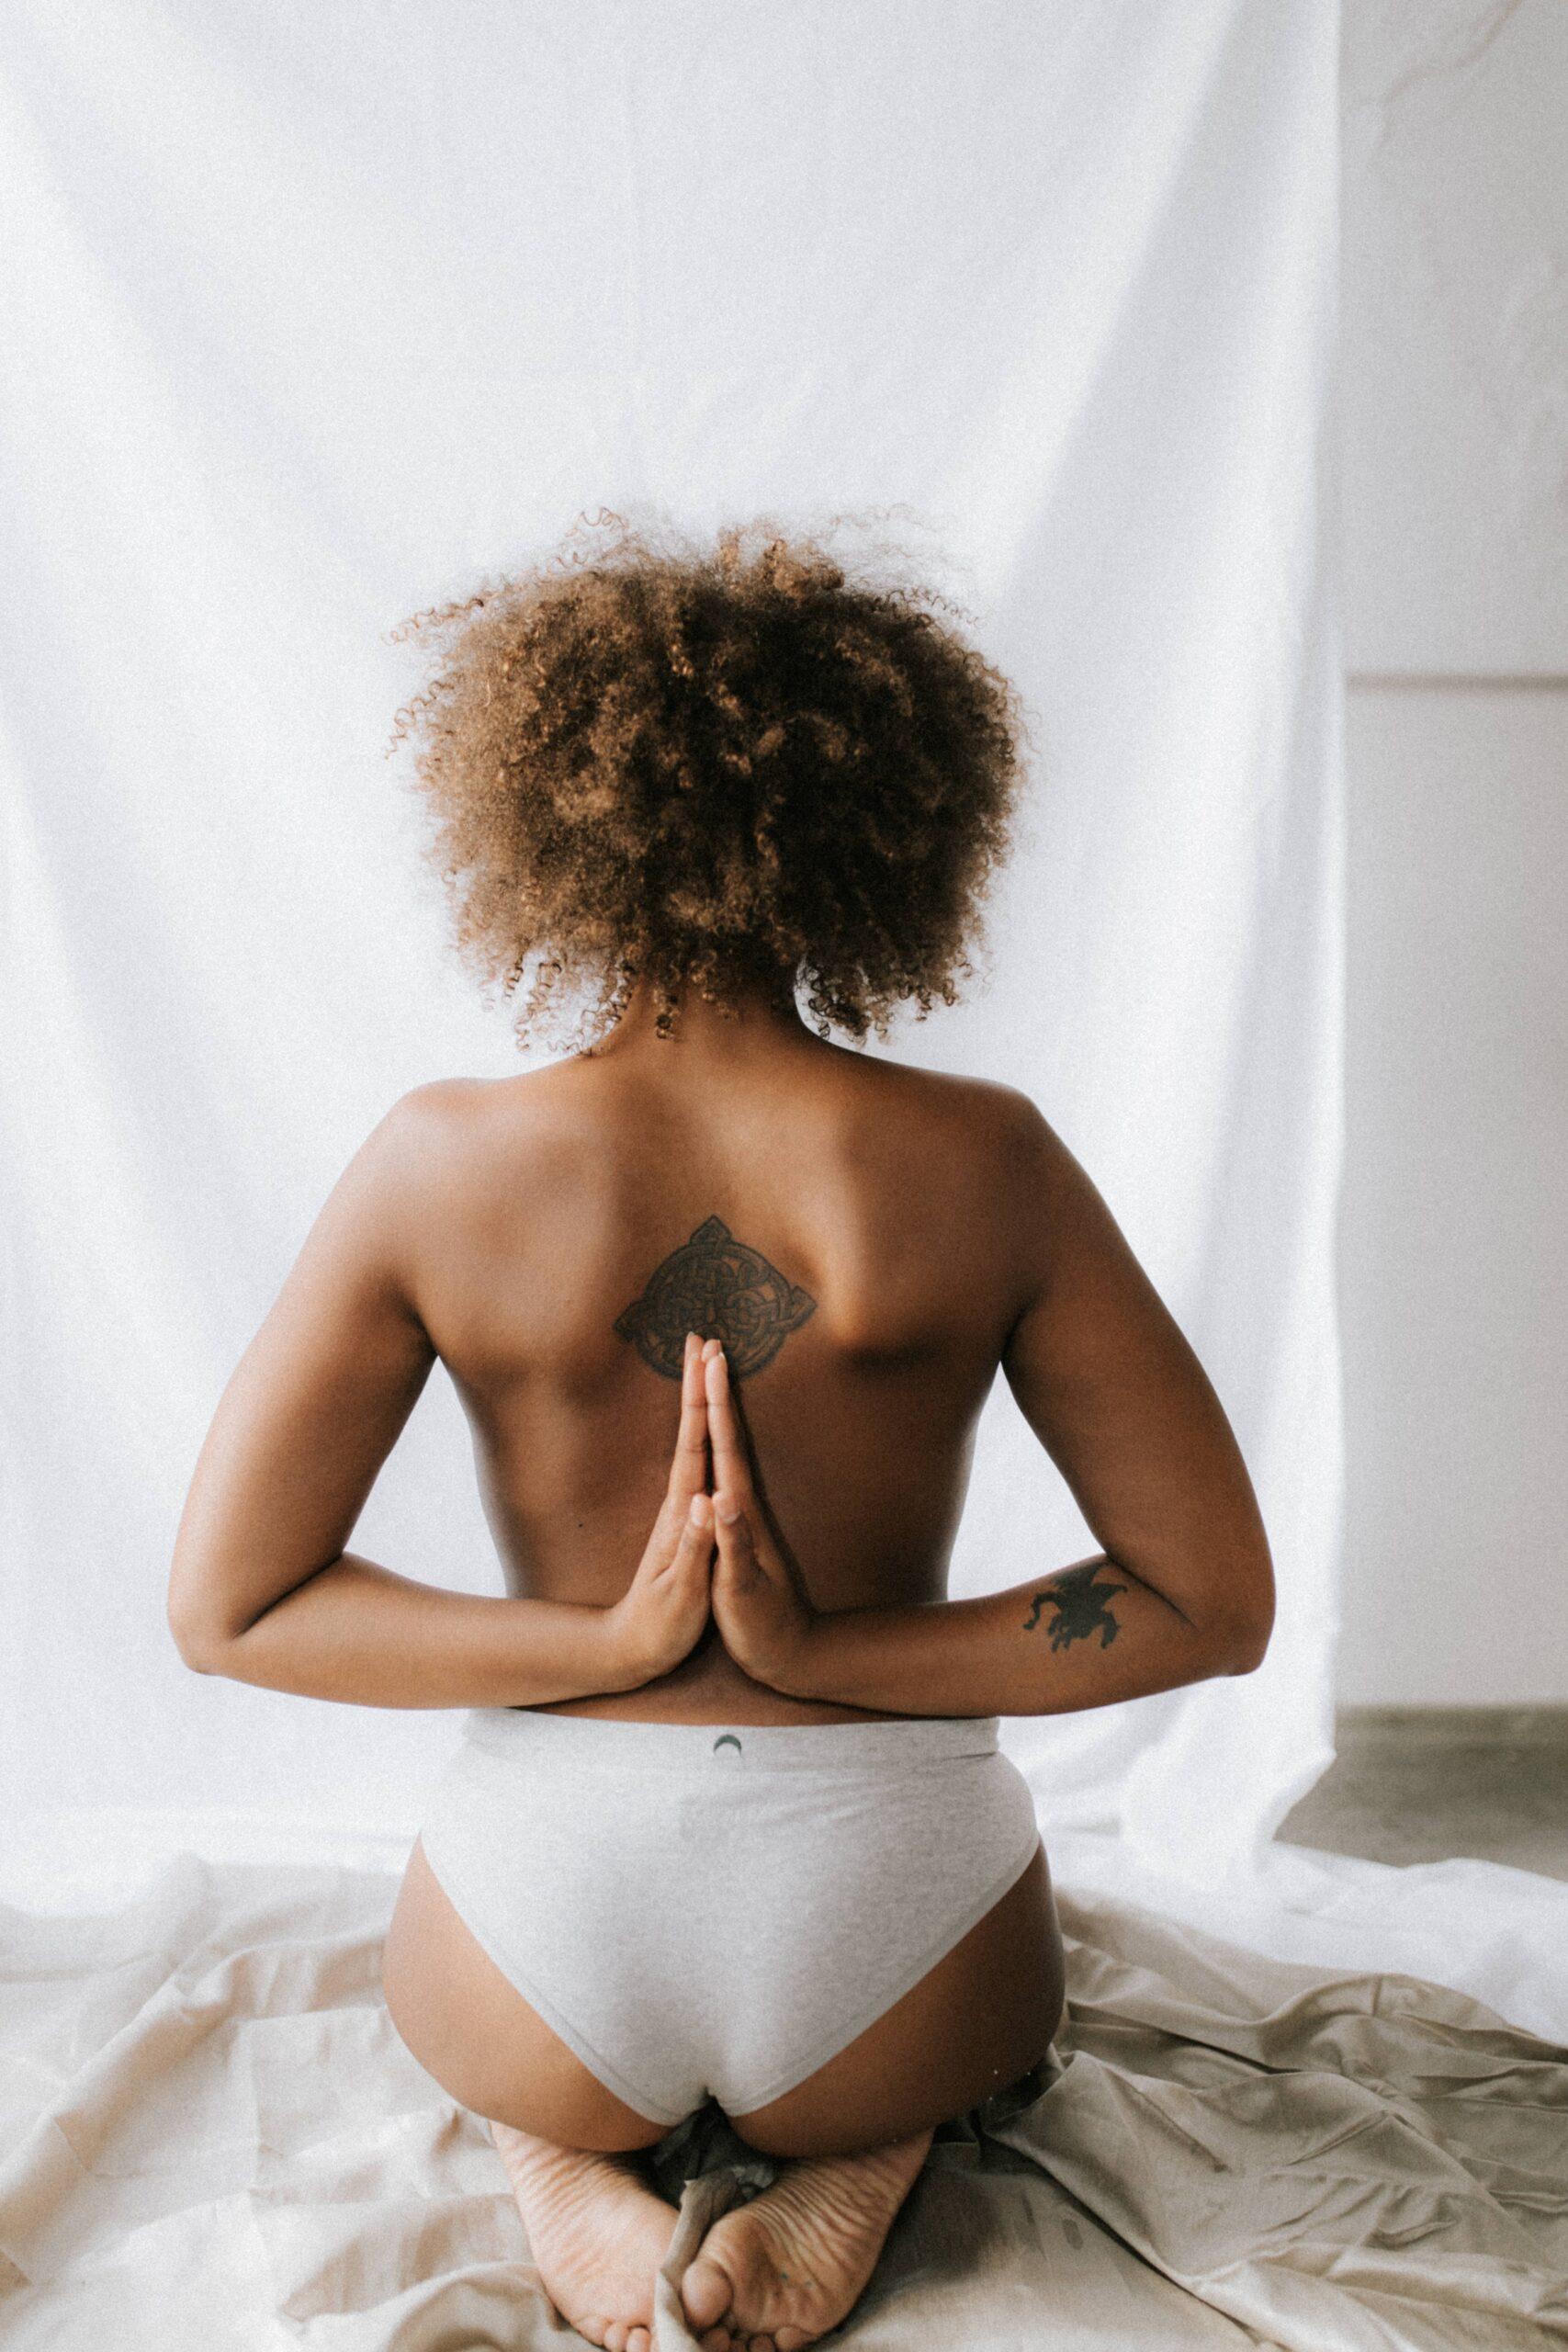 africa organics review yoga pose